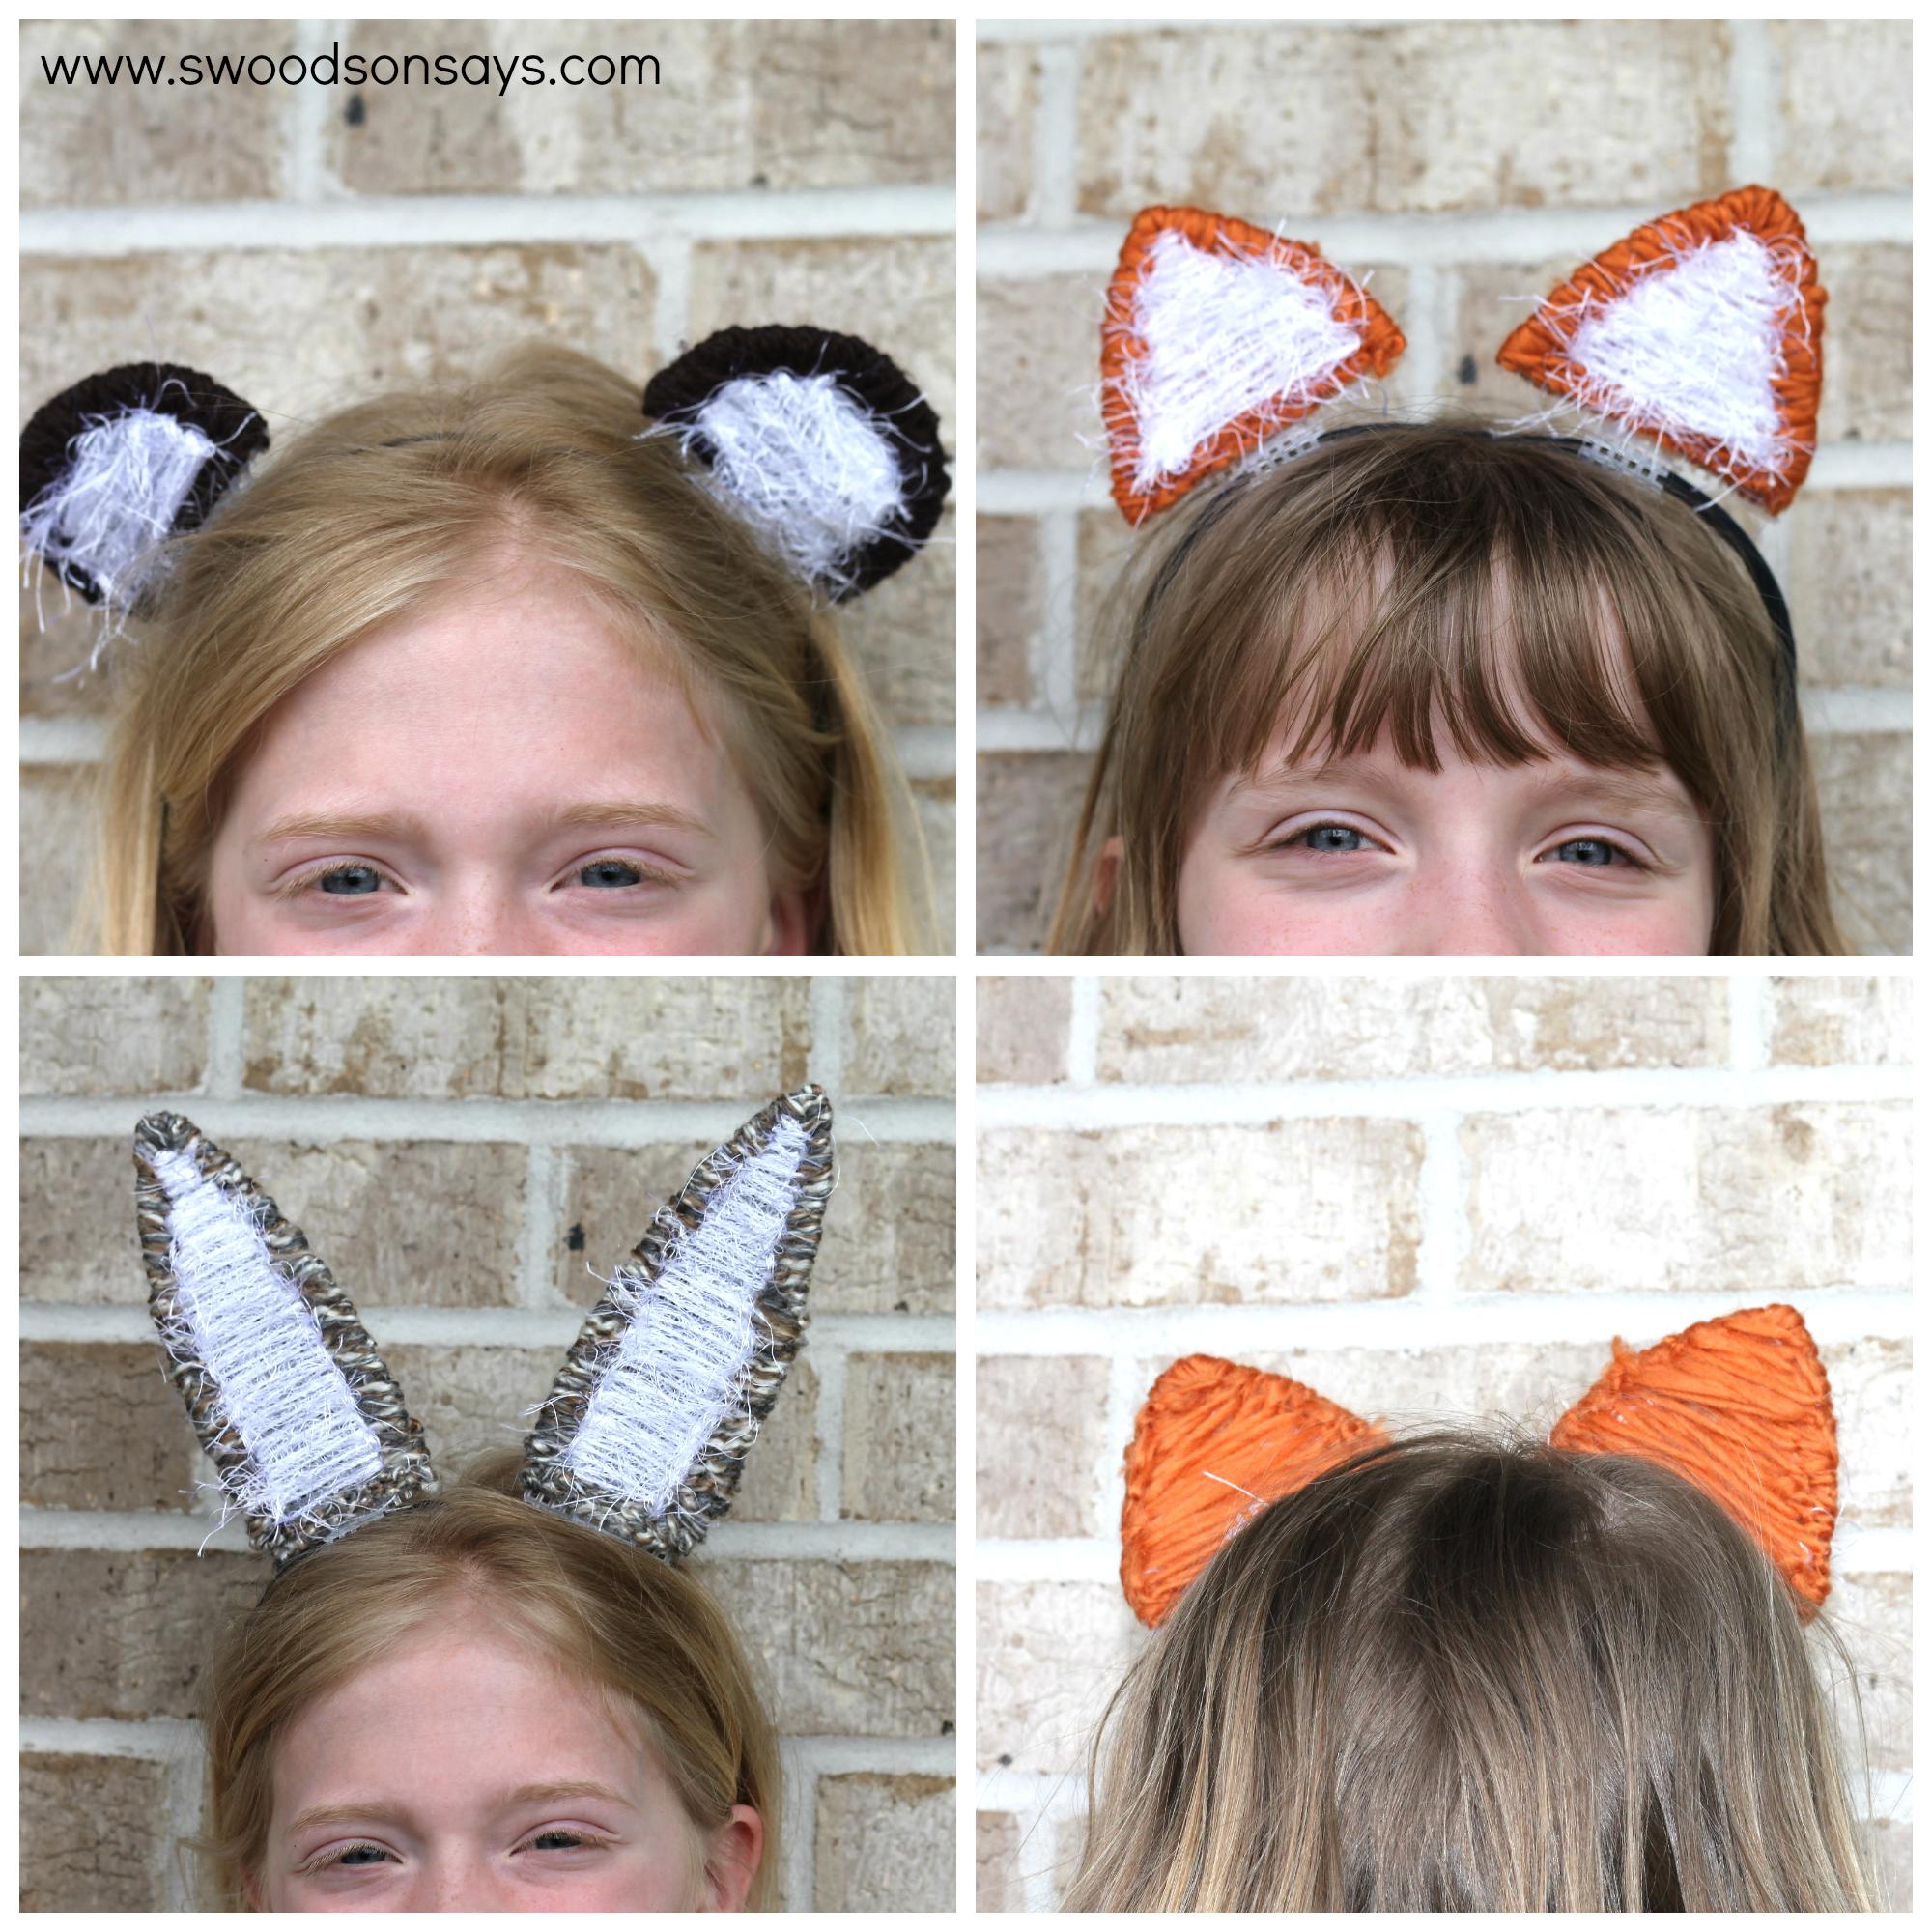 DIY Interchangeable Animal Ear Headband - swoodson Says